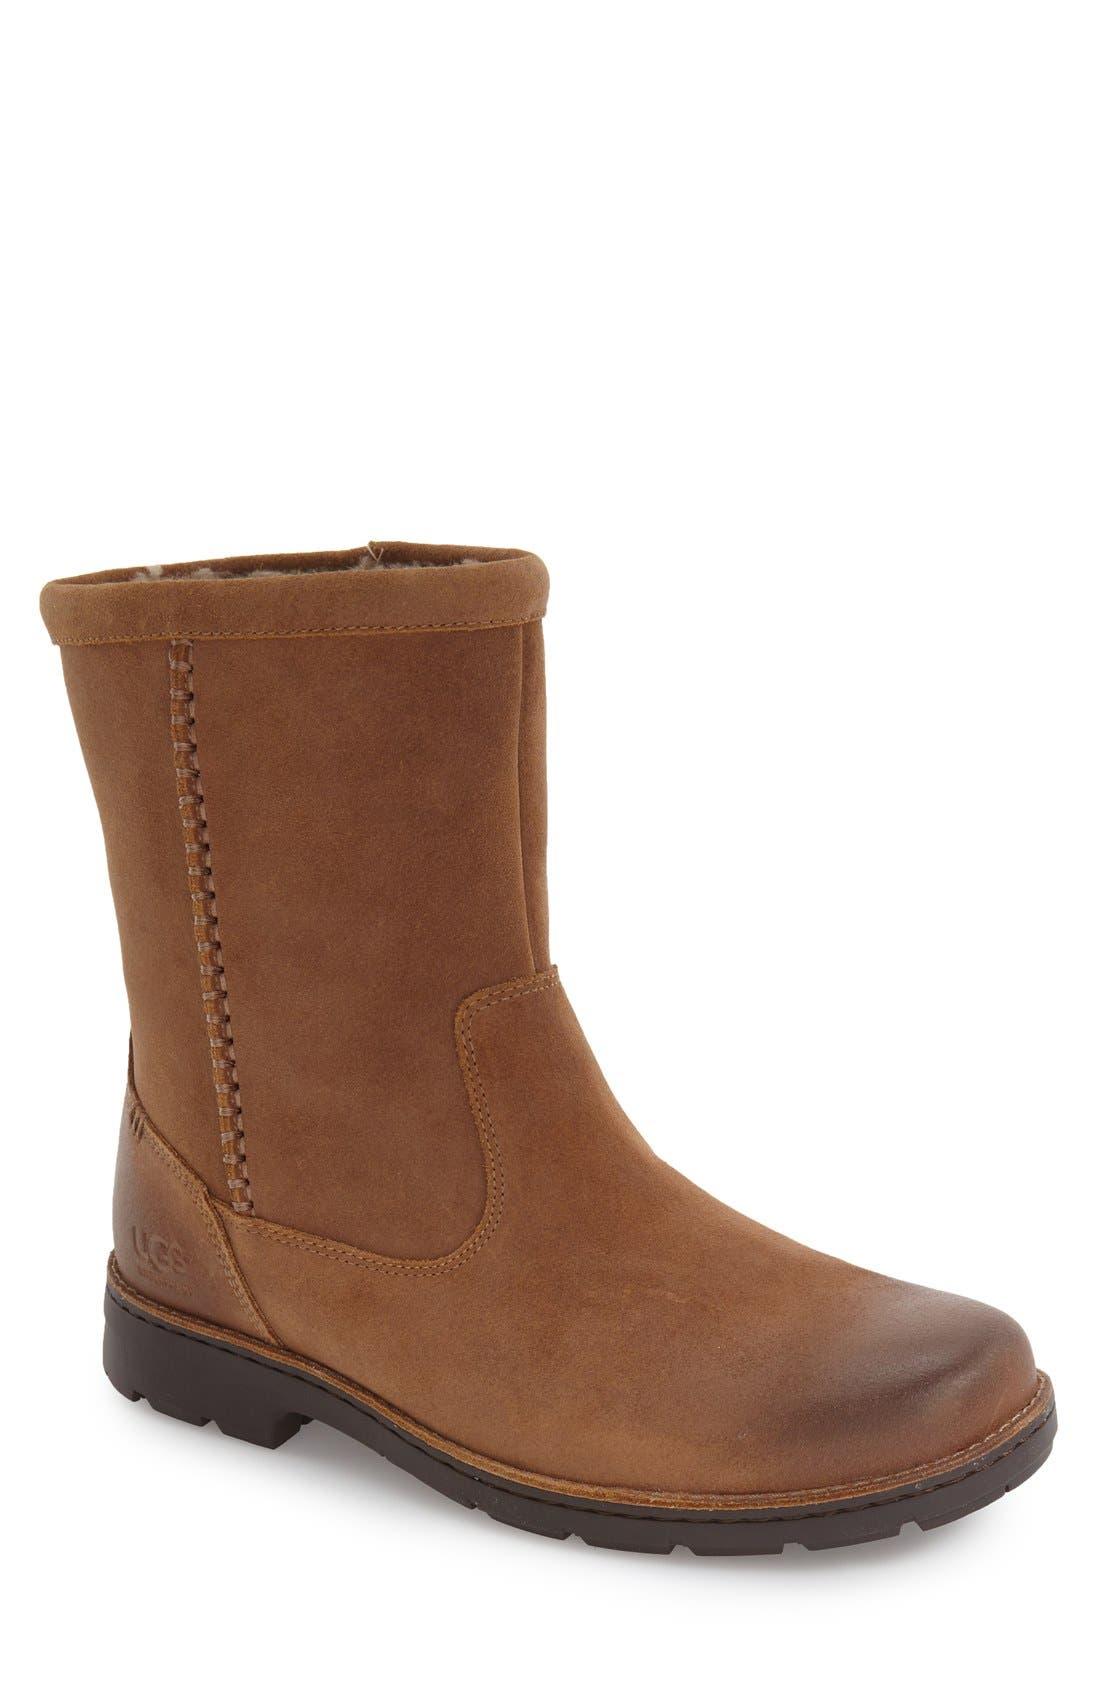 Foerster Pull-On Boot,                         Main,                         color, Dark Chestnut